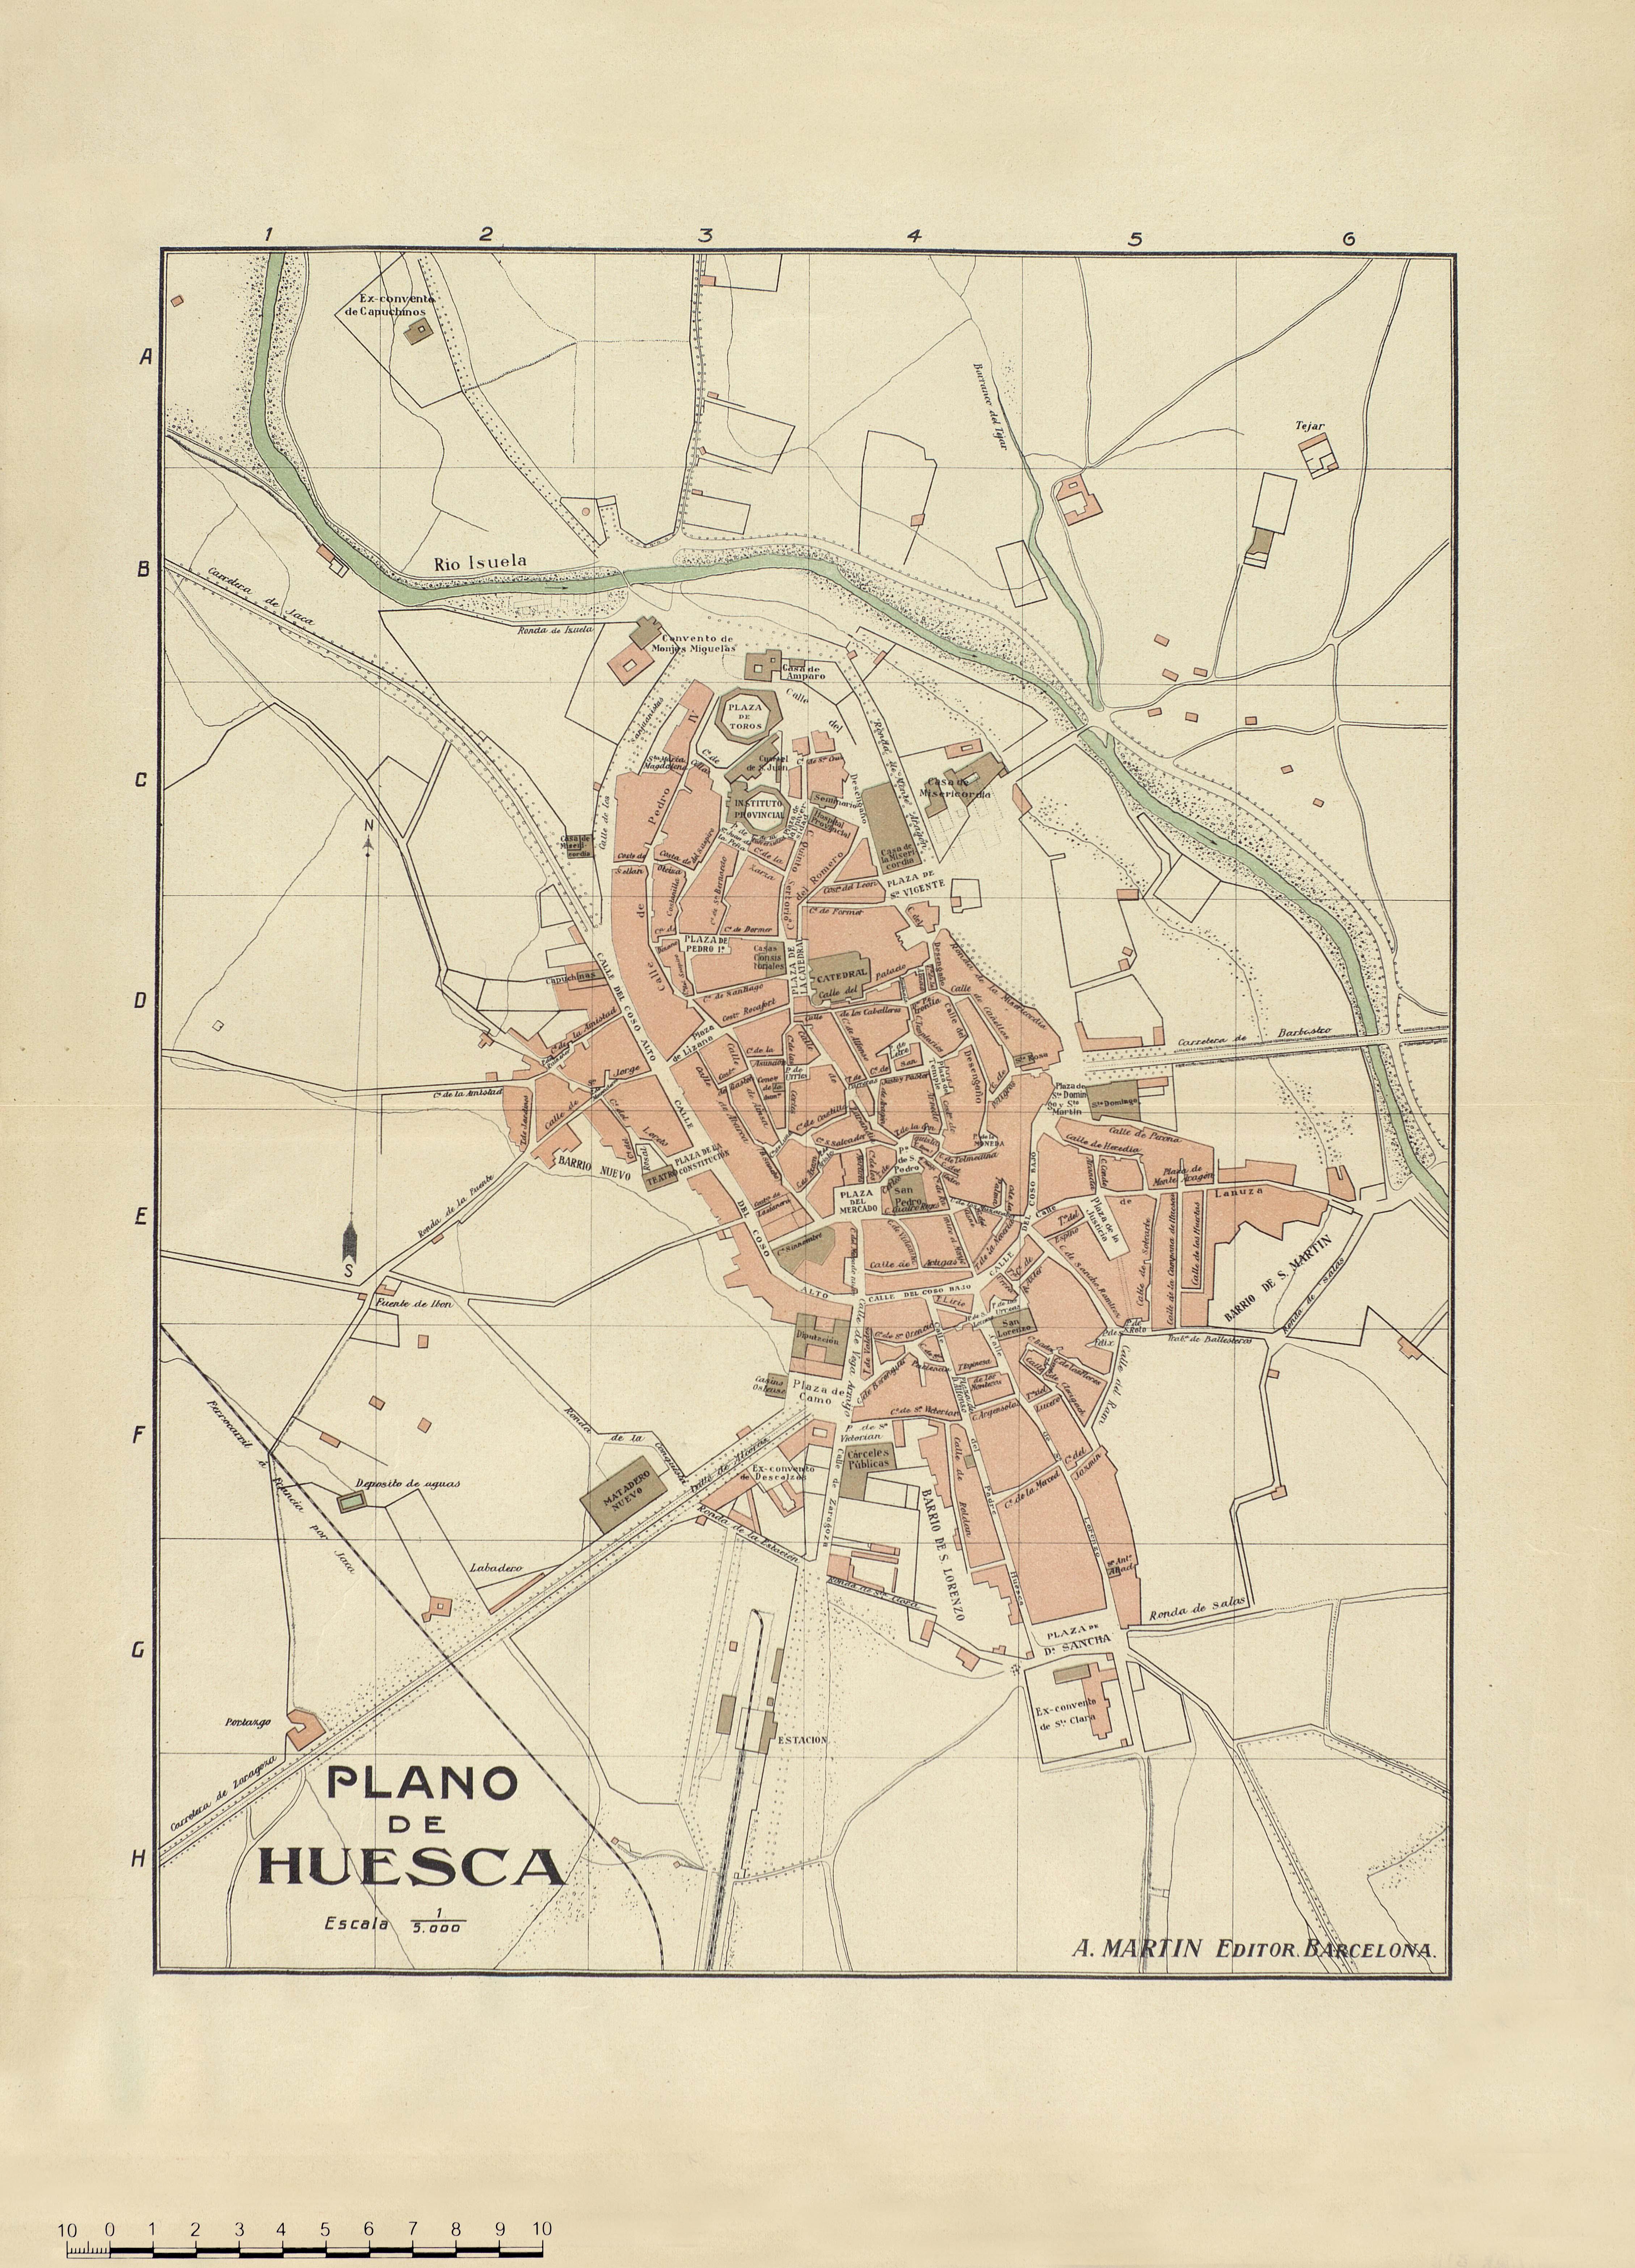 Plano de Huesca